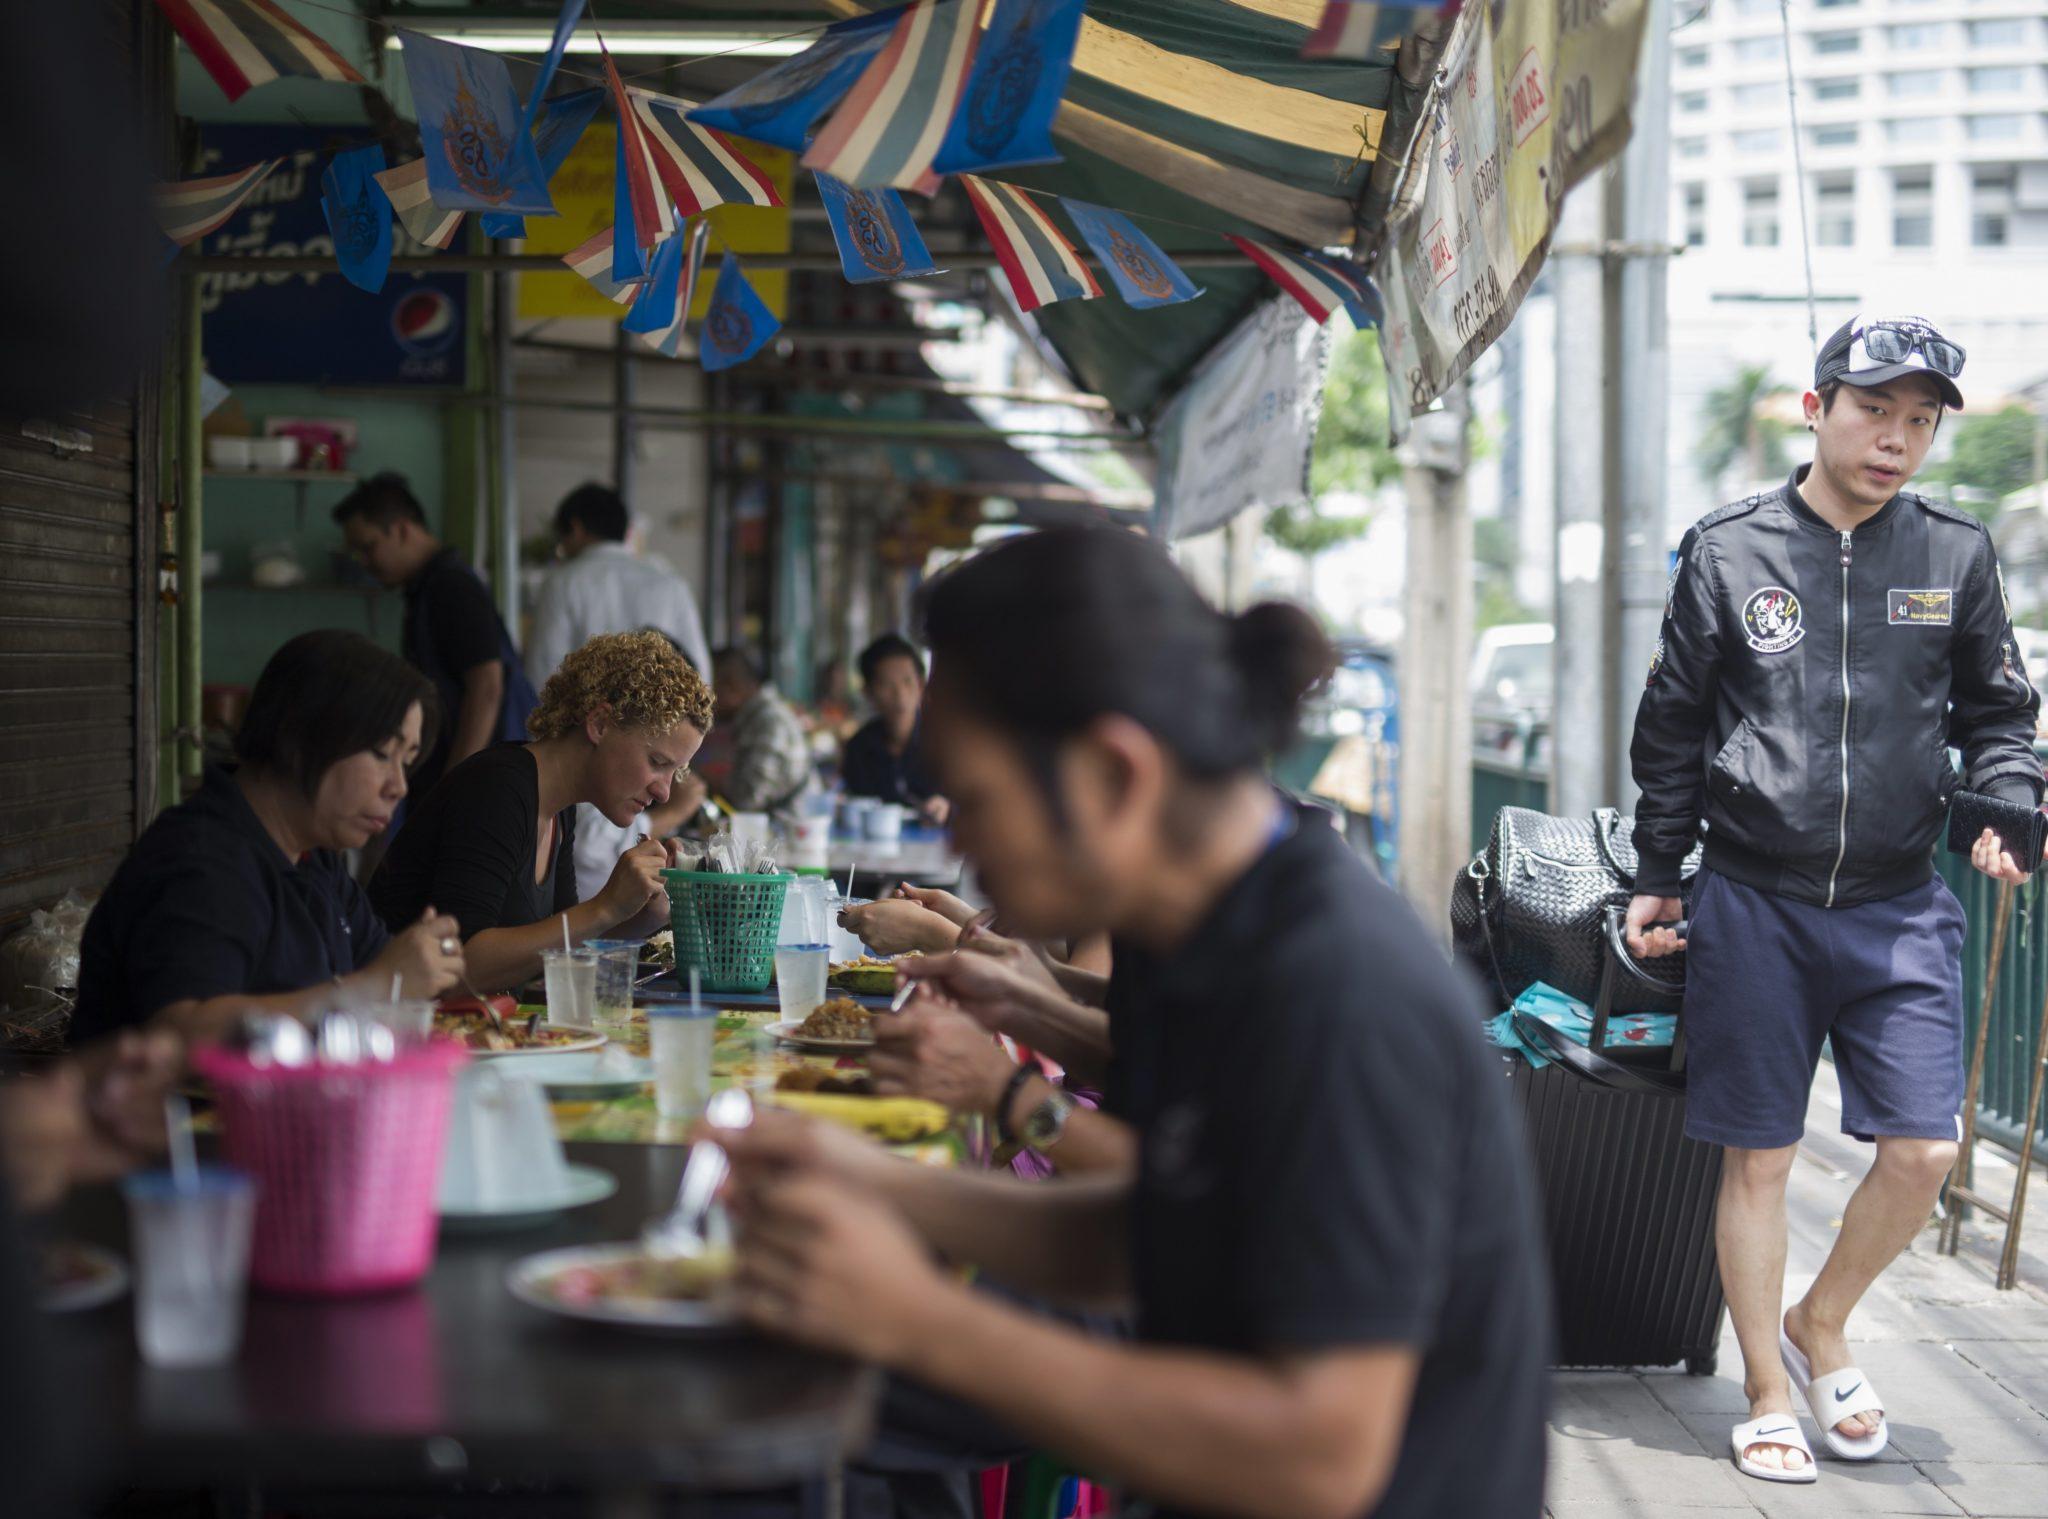 Tajlandia: uliczne restauracje w Bangkoku (foto. PAP/EPA/RUNGROJ YONGRIT)